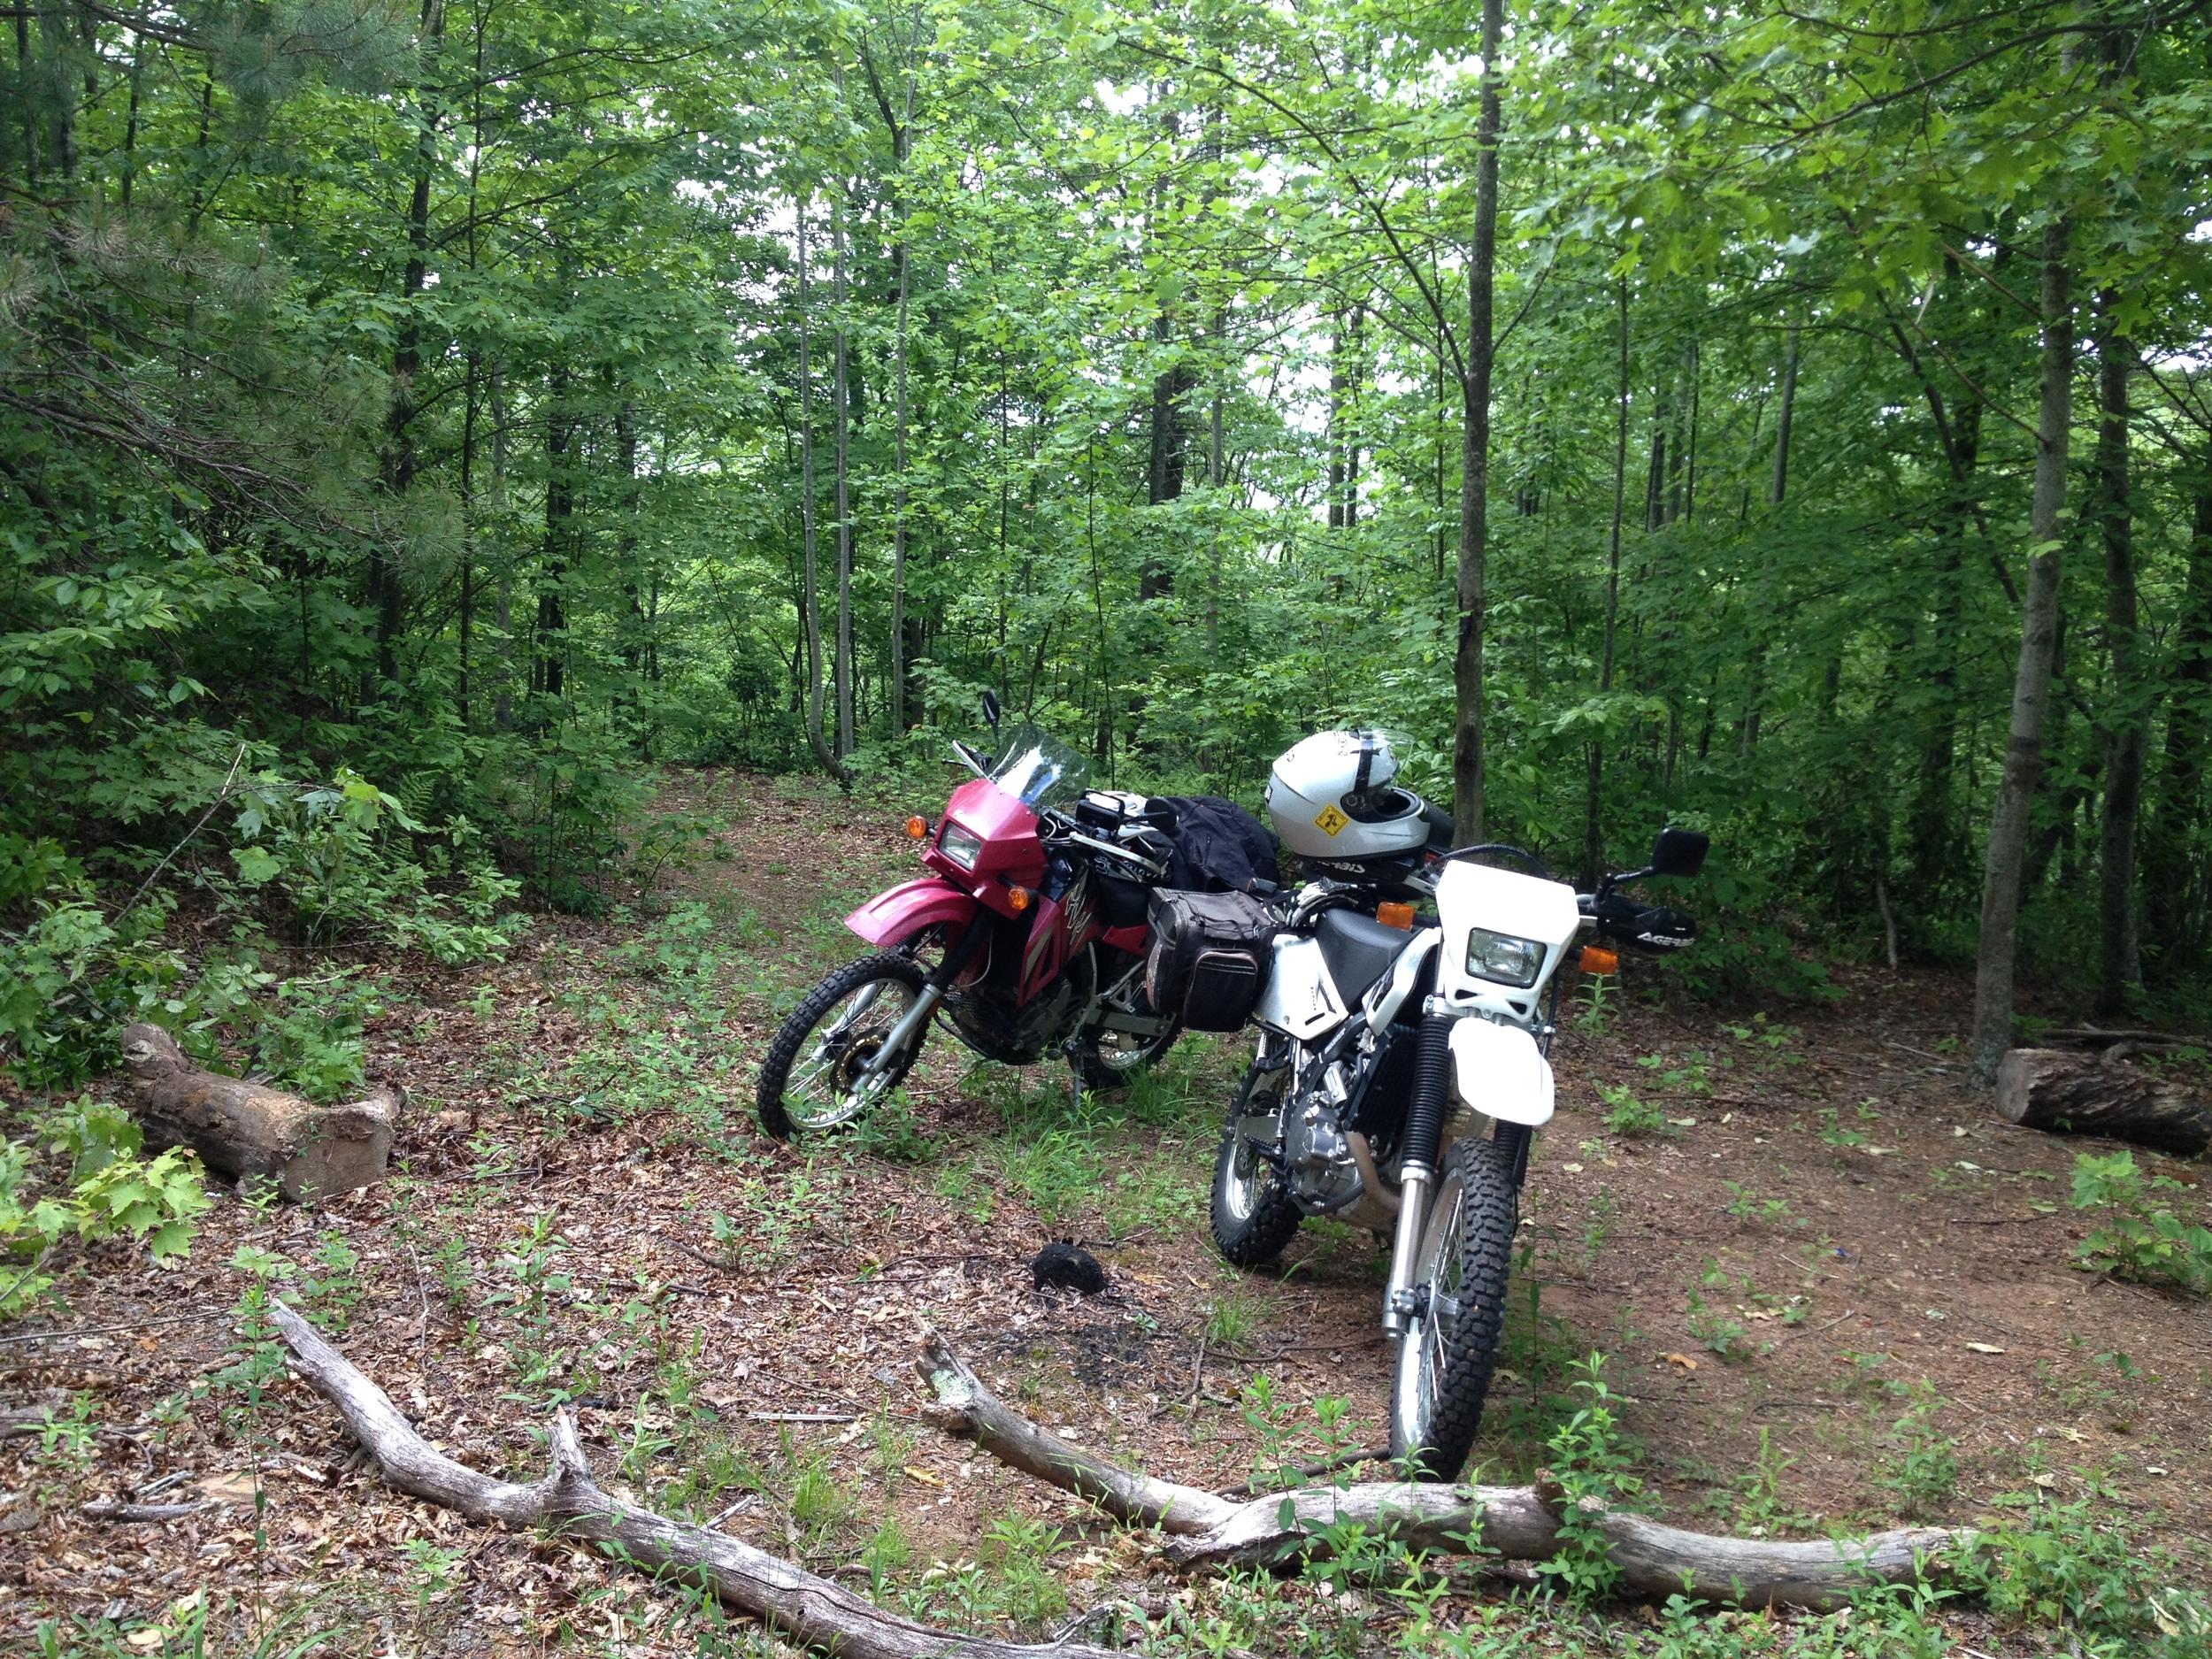 Quality Trail Time